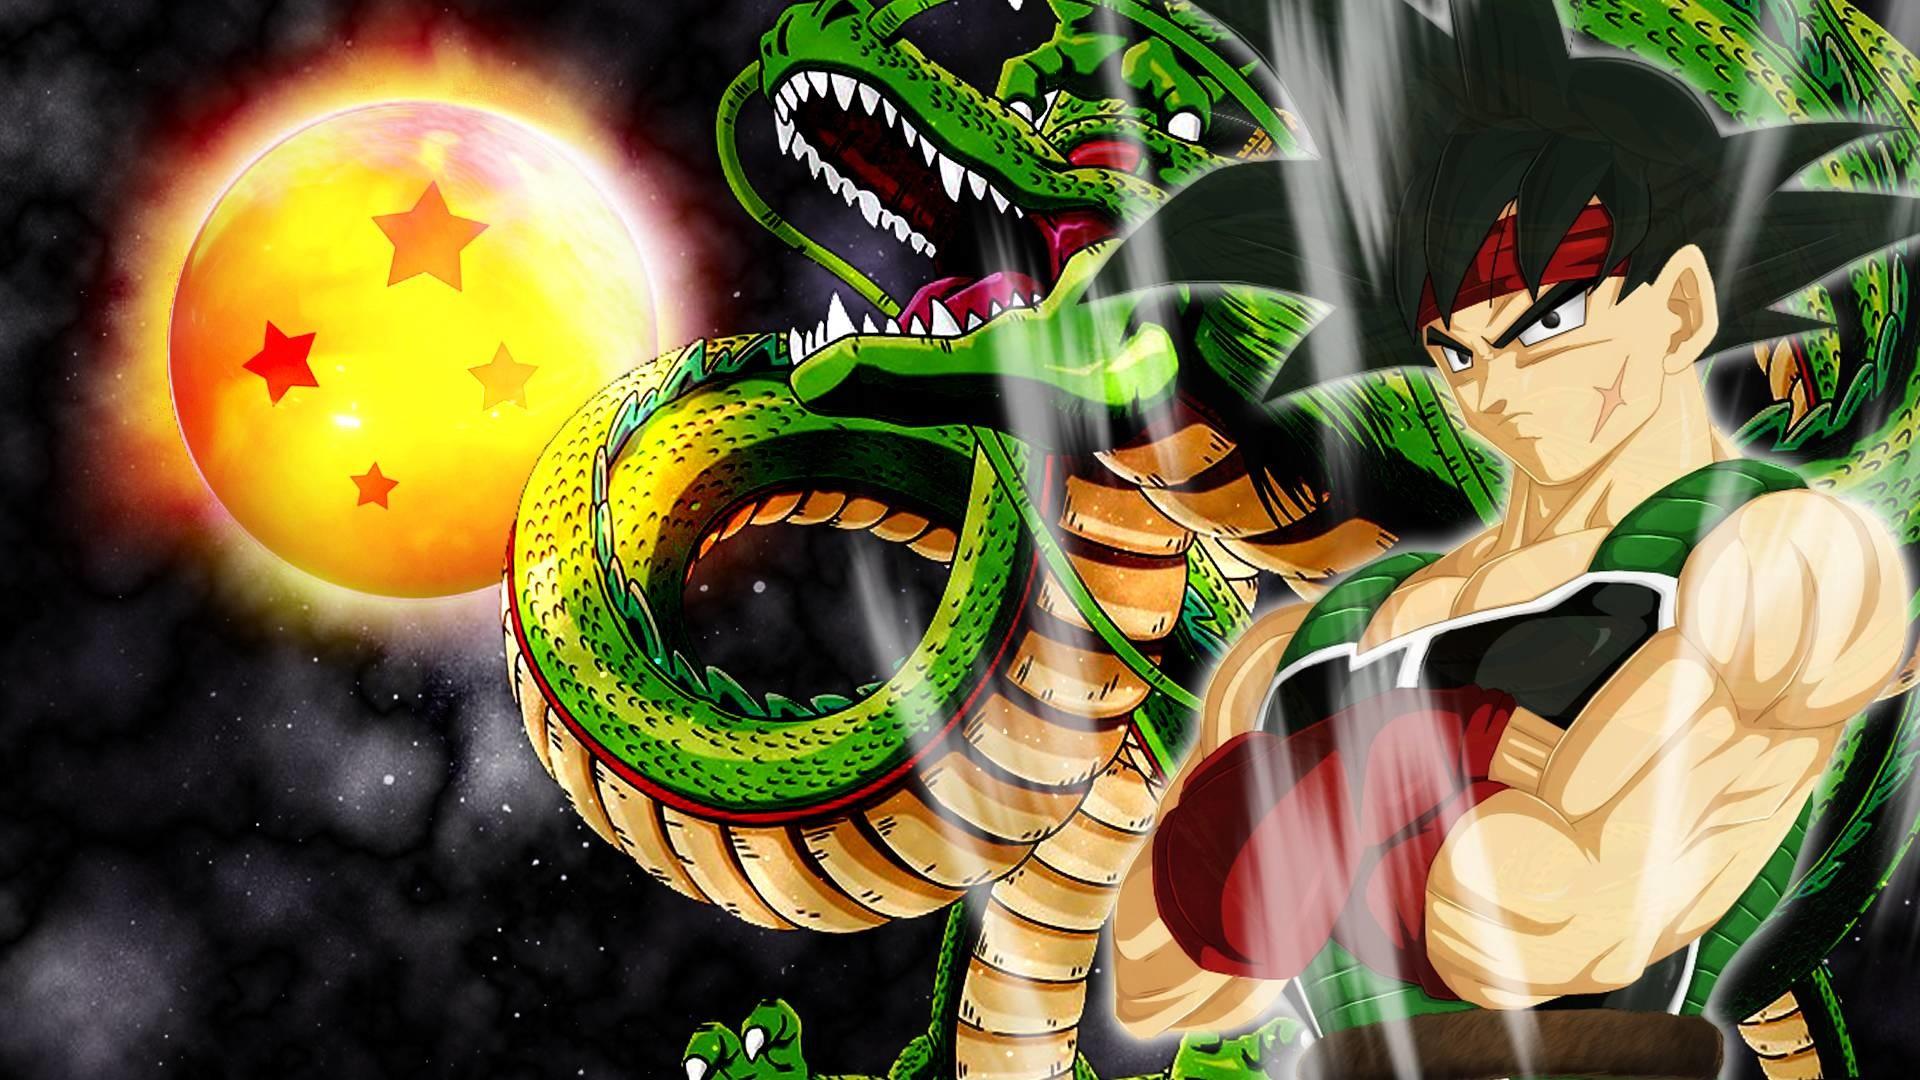 Dragon Ball Z Bardock Wallpaper 76 Images